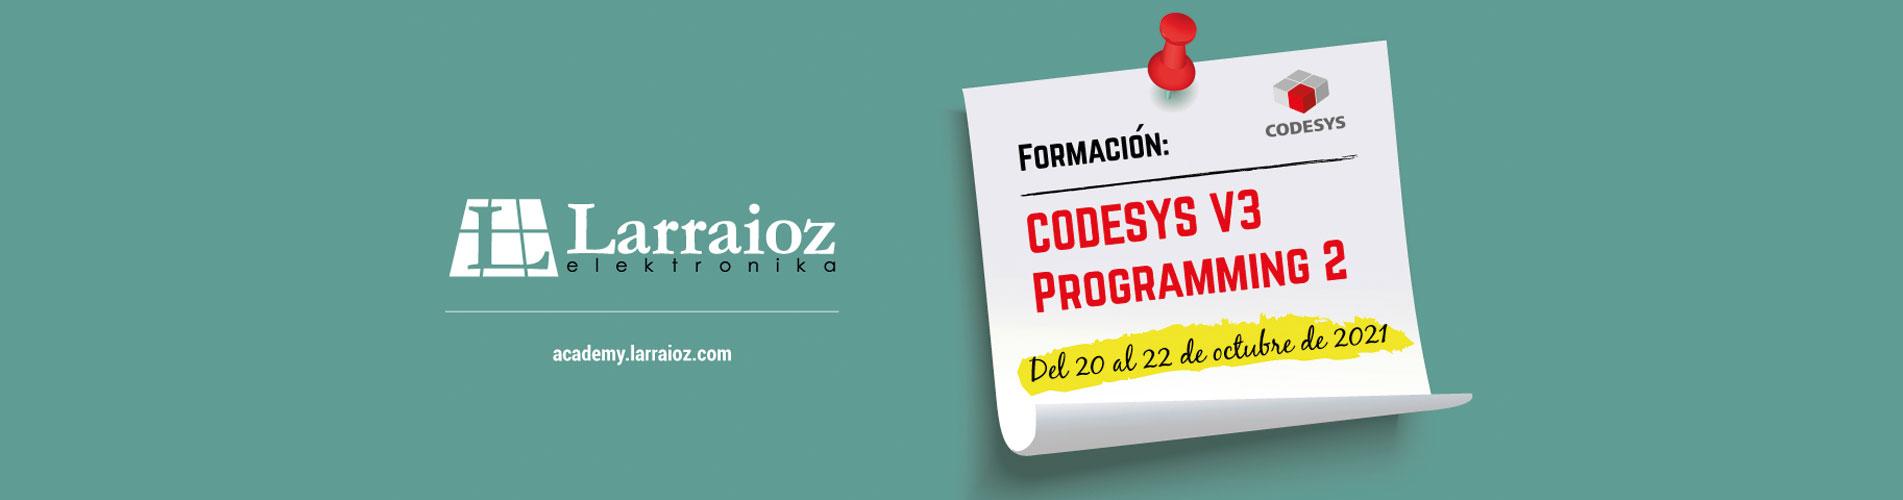 FORMACIÓN CODESYS PROGRAMMING 2 en Larraioz Elektronika